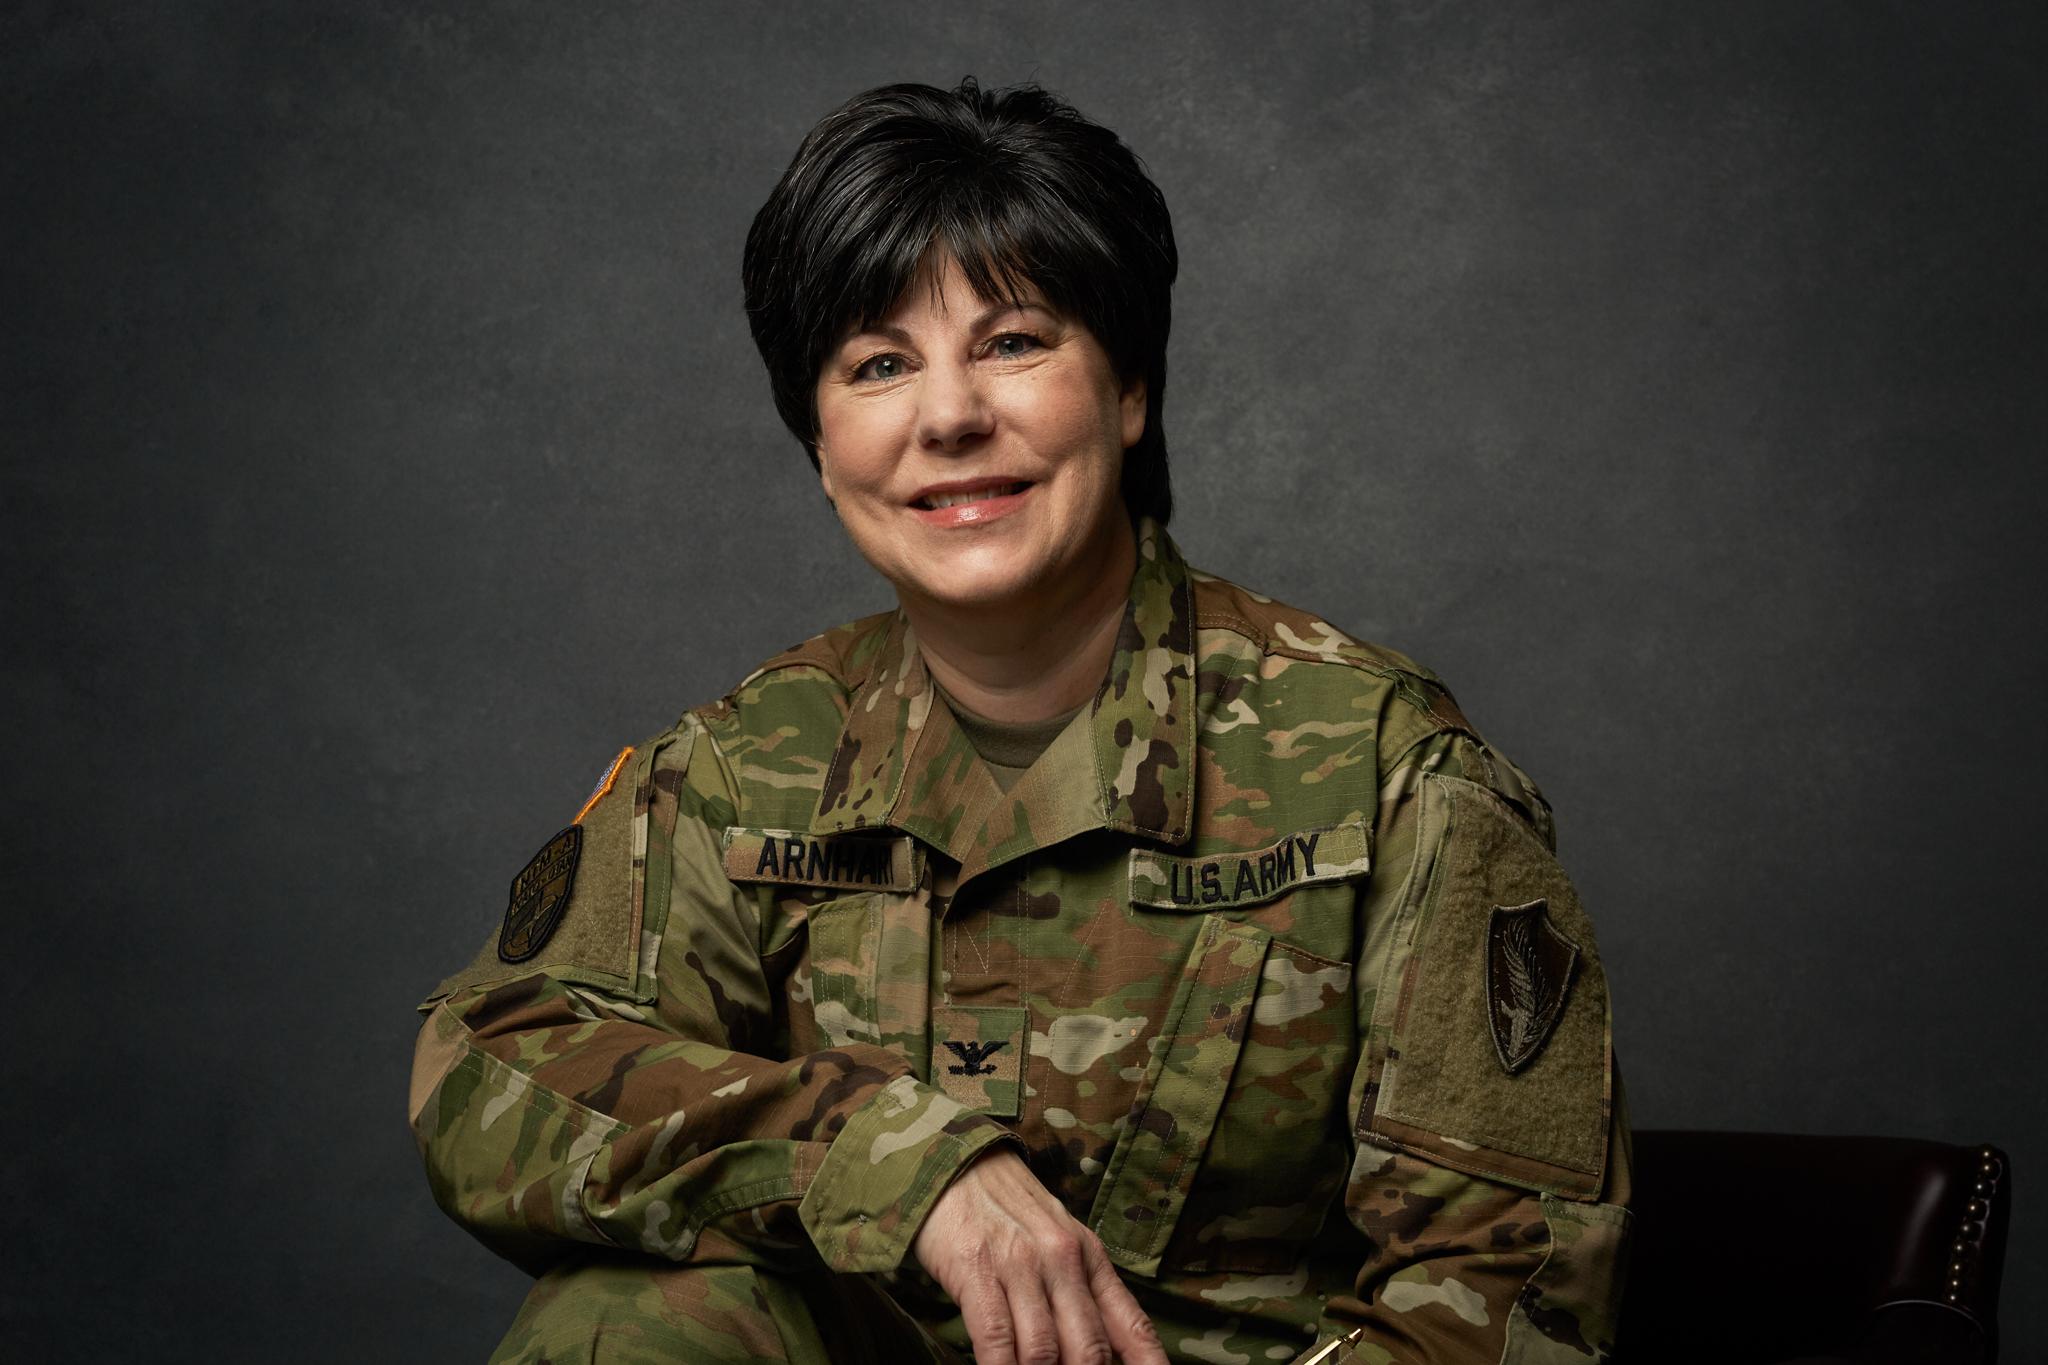 Jenn-McIntyre-Portraits-Lynette-Arnhart-Army3.jpg